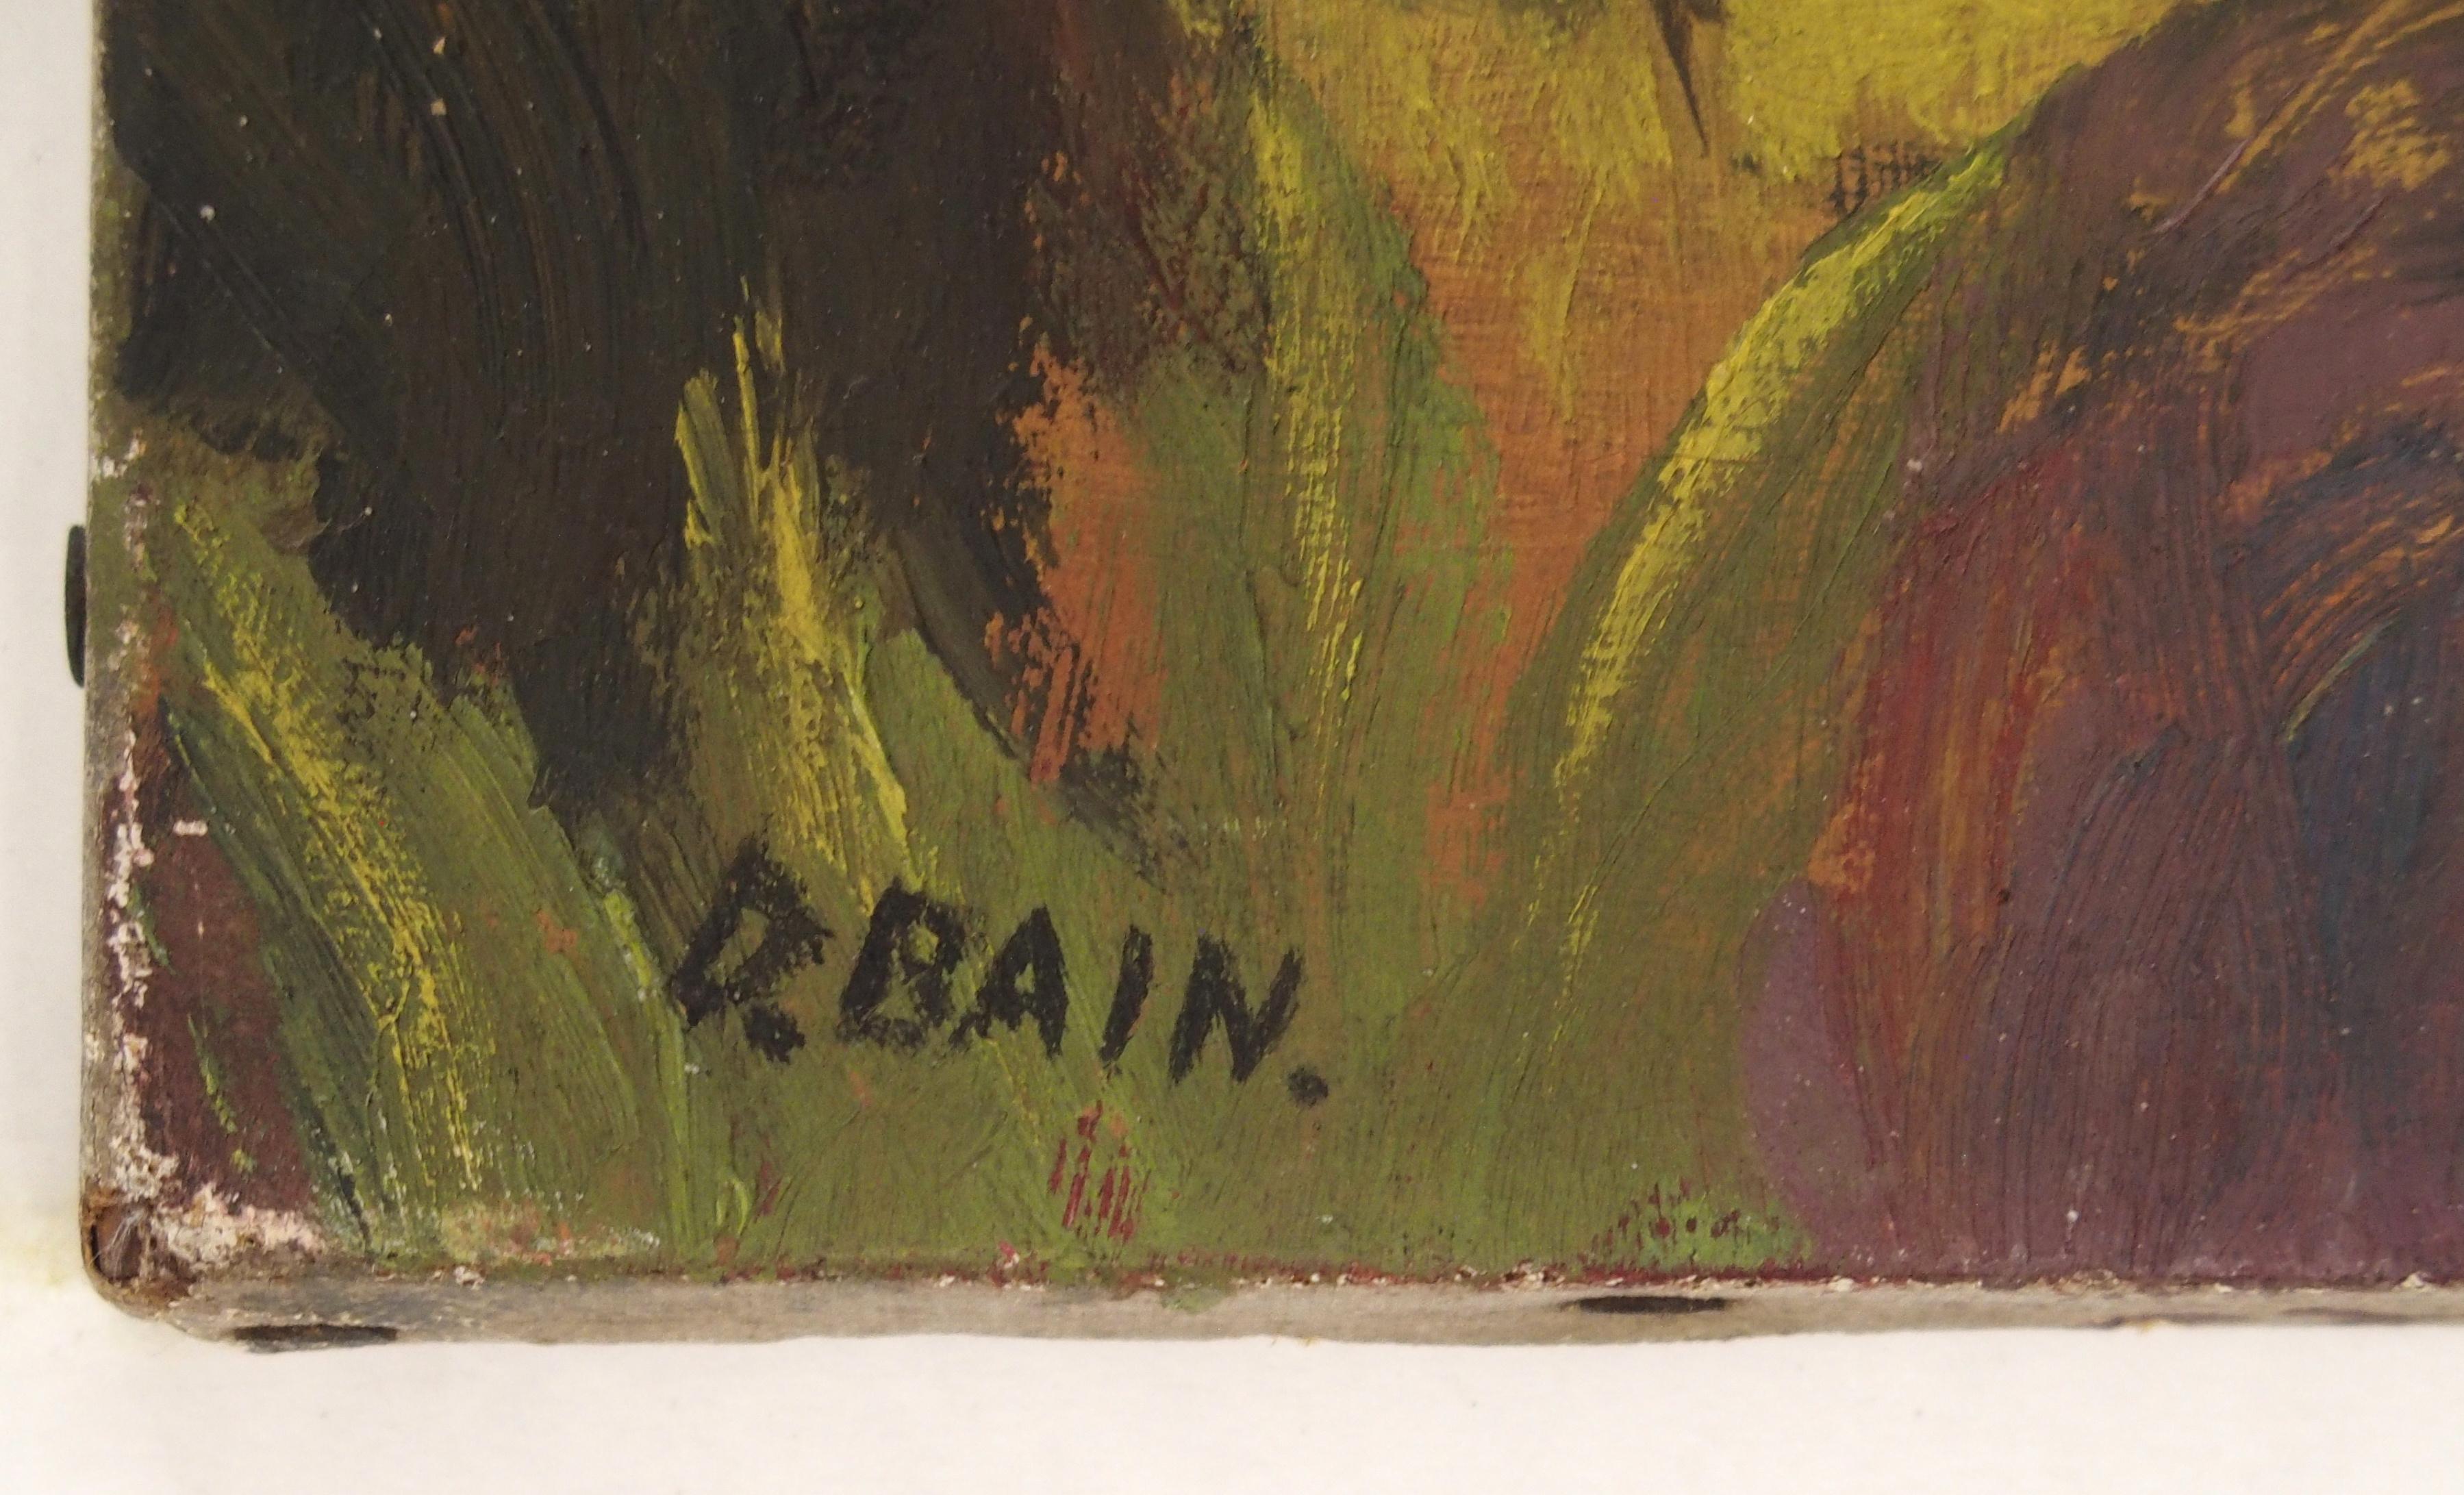 •DONALD BAIN (SCOTTISH 1904-1979) CHILD PORTRAIT oil on canvas, signed, 26 x 18cm Condition - Image 2 of 3